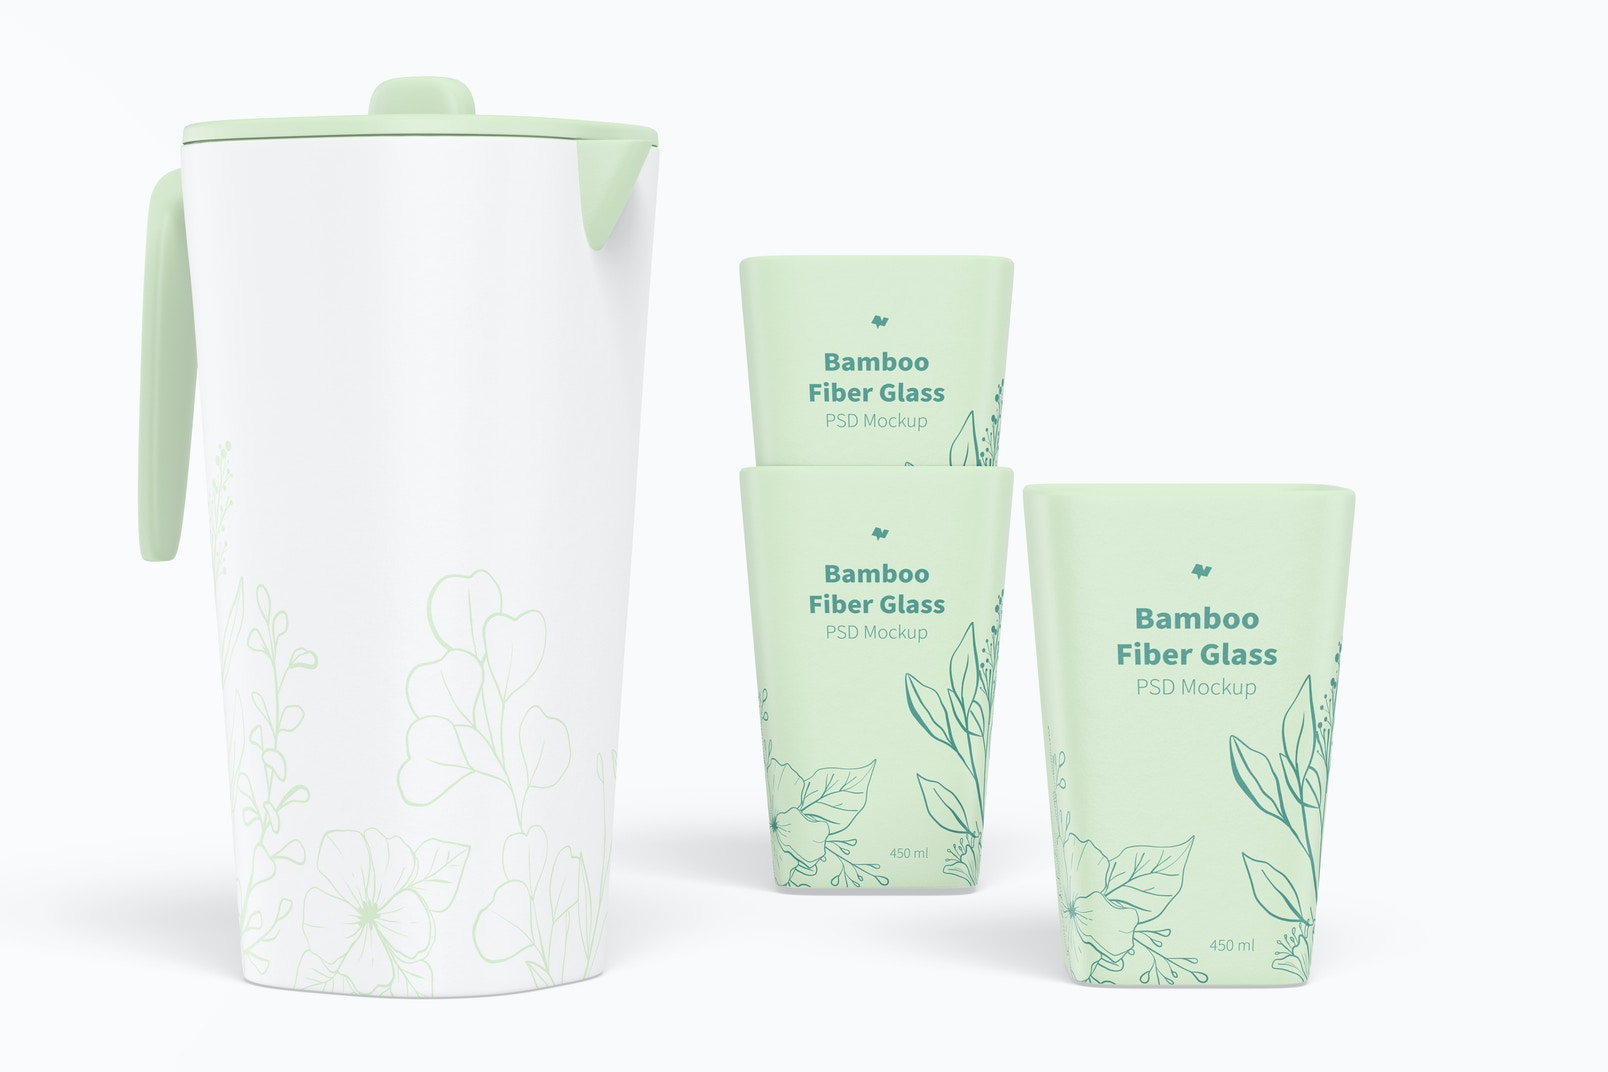 450 ml Bamboo Fiber Glasses Mockup